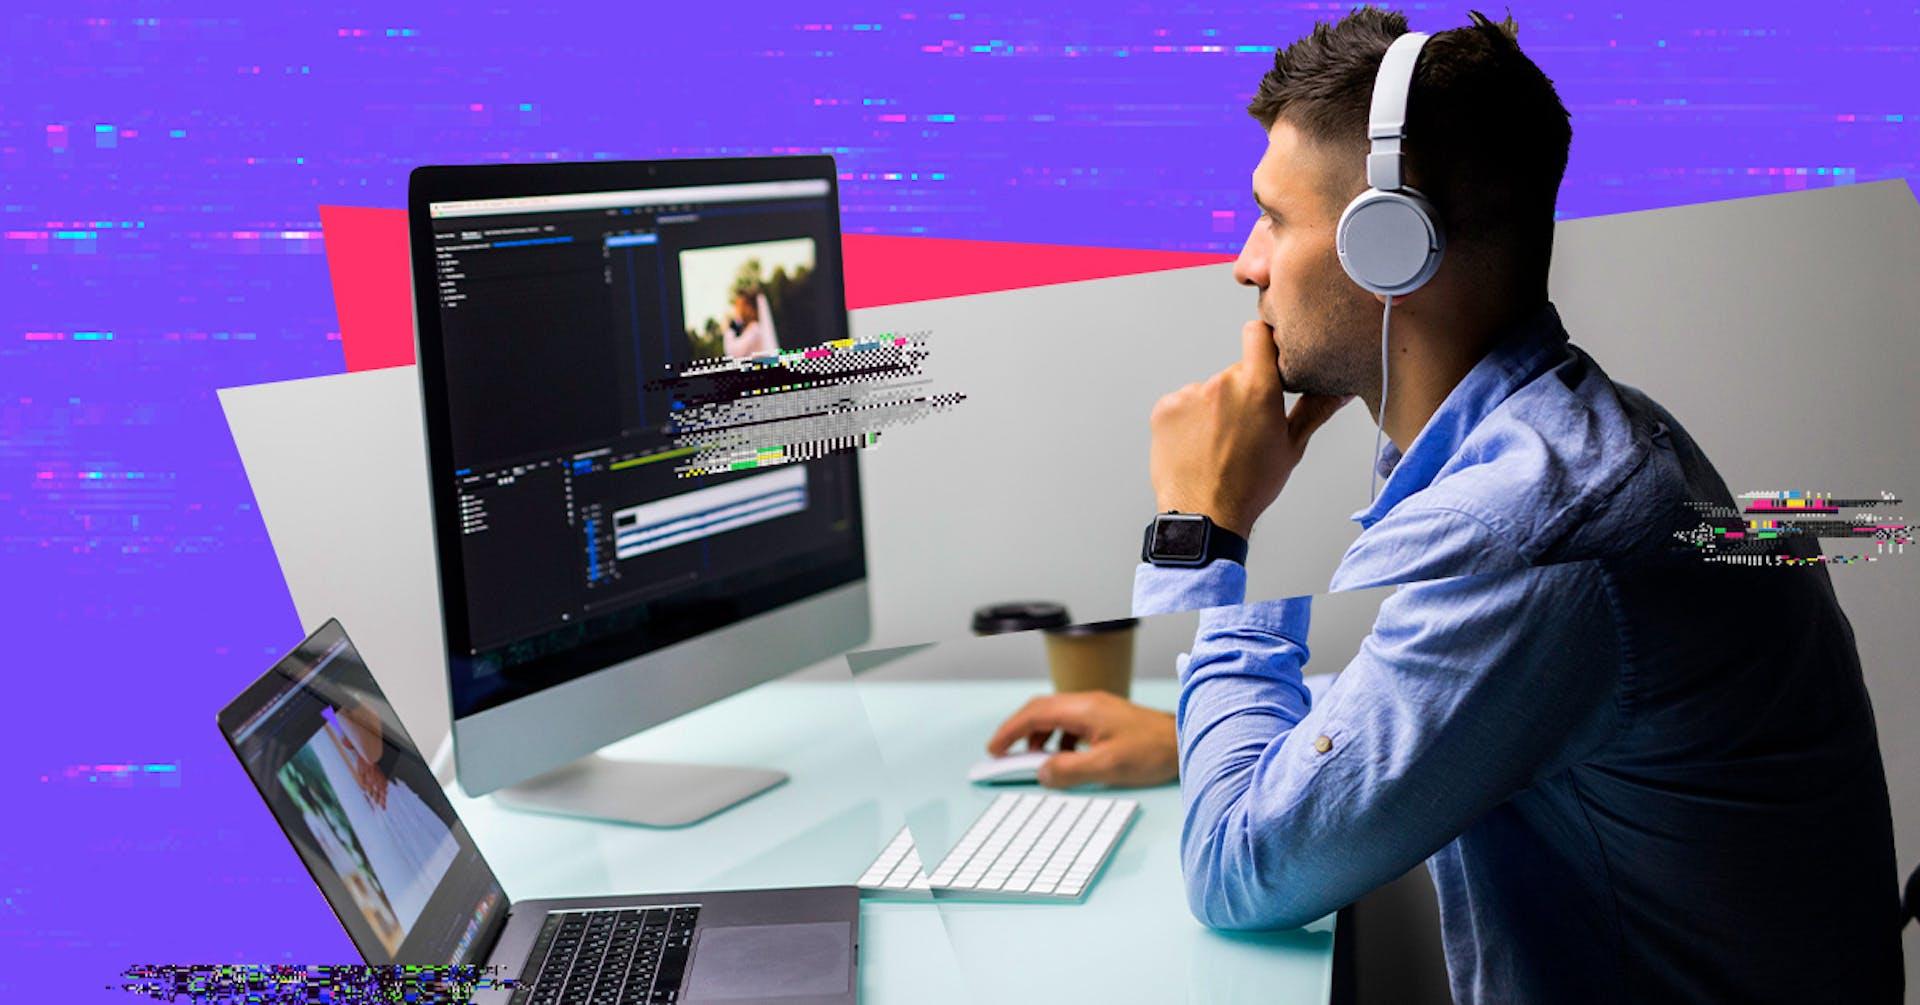 4 coisas que eu gostaria de saber antes de editar vídeos